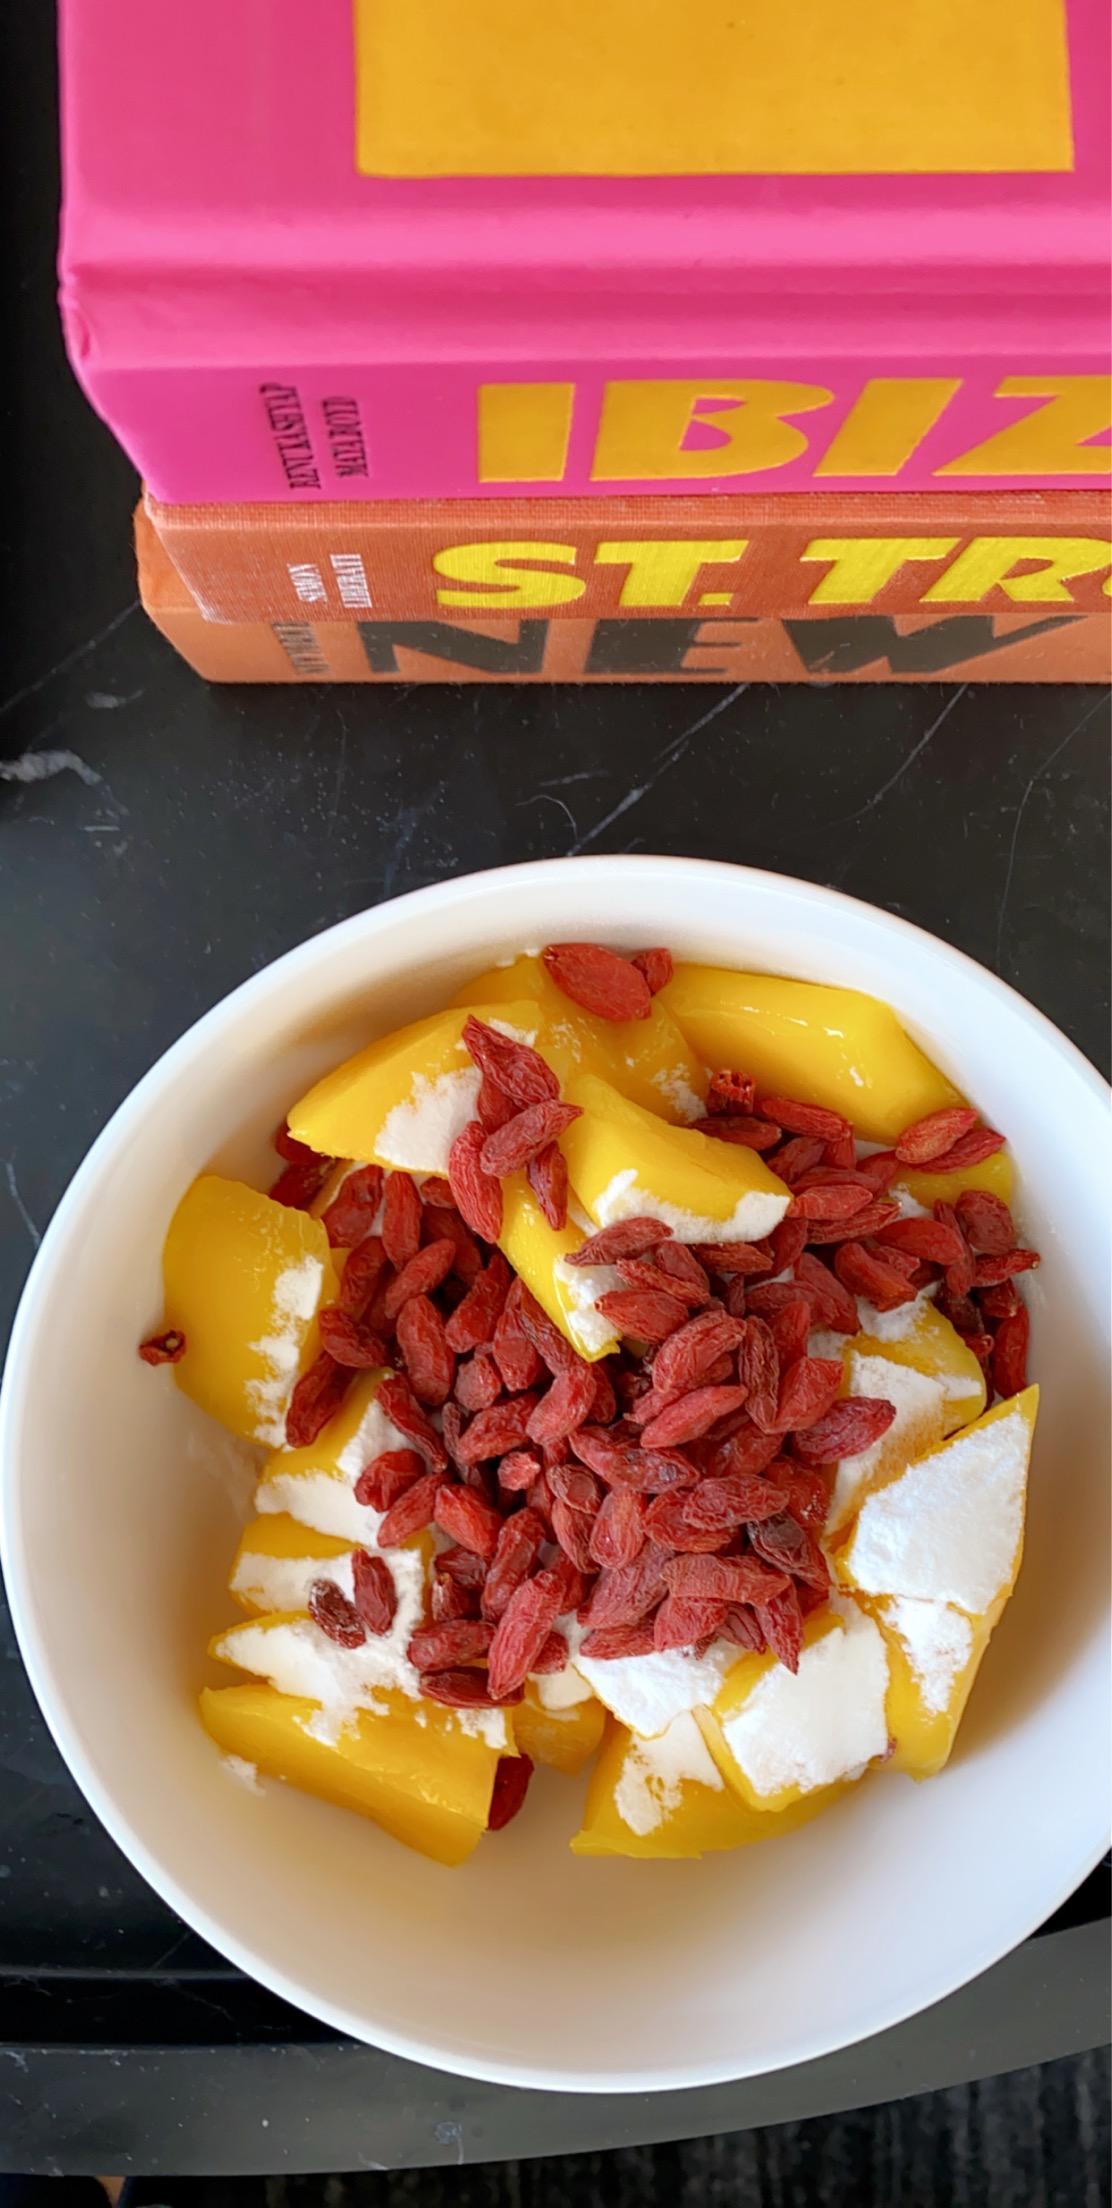 Goji Berries A True Superfood